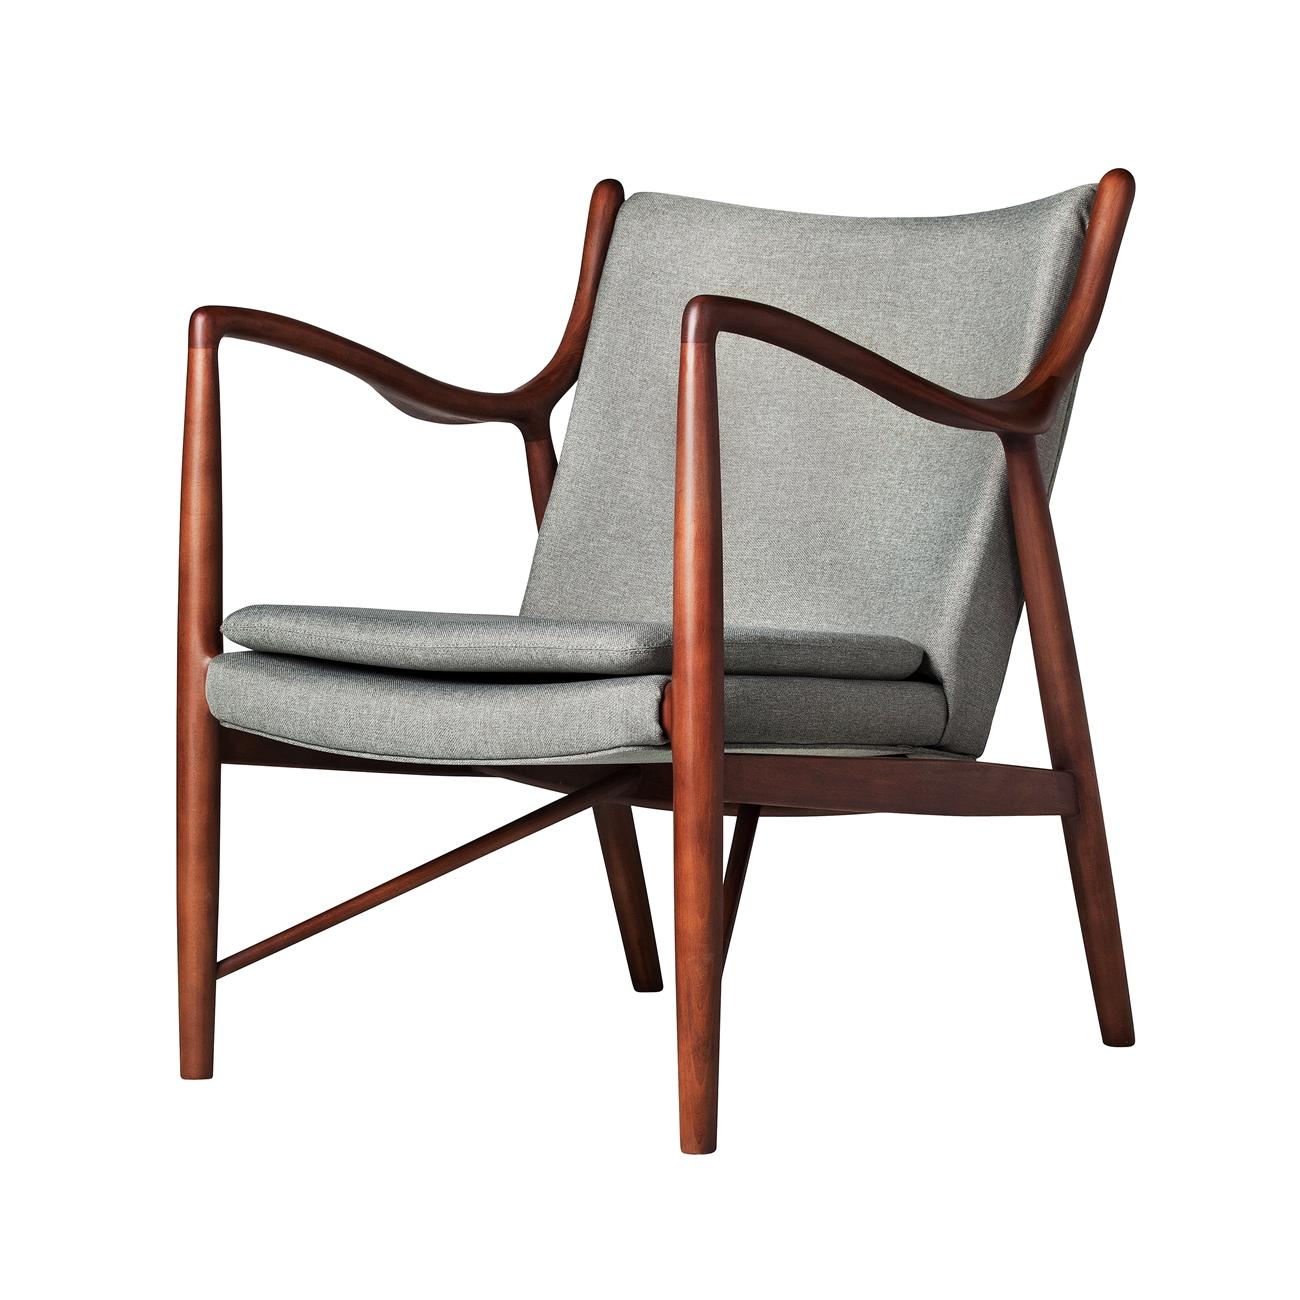 light grey chair charleston and a half finn juhl style 45 dark the khazana home furniture store